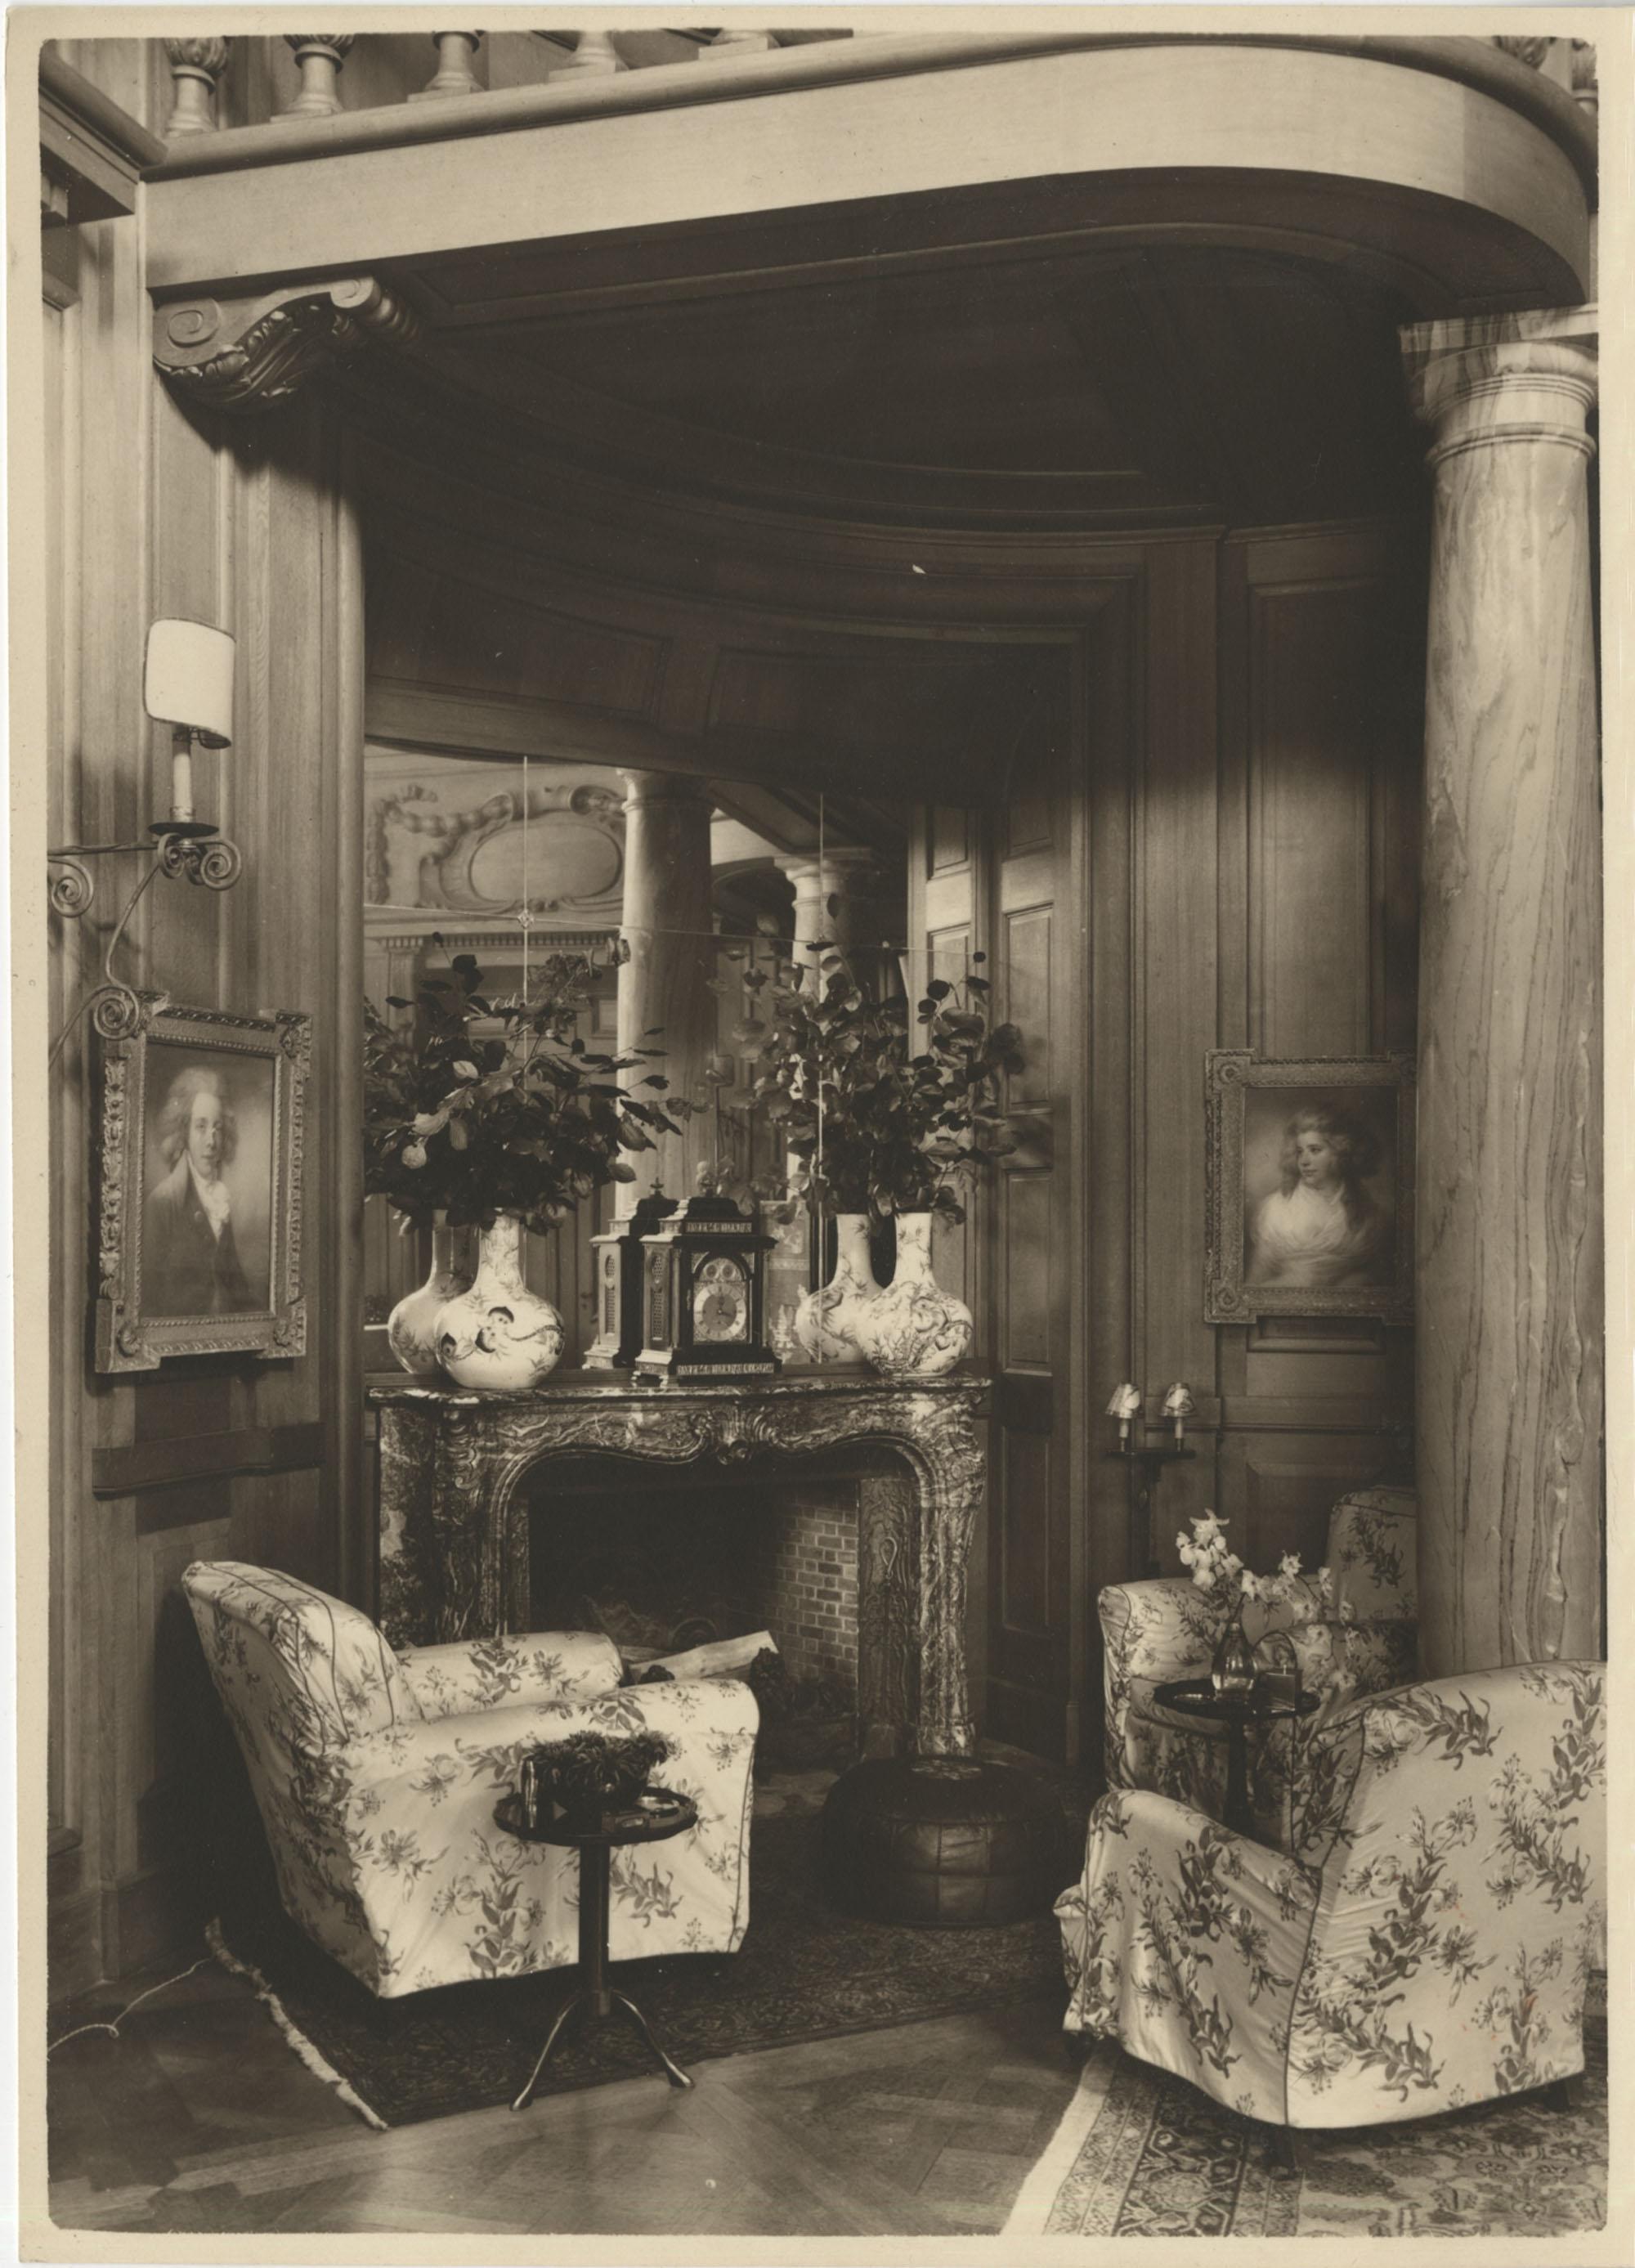 Interior of the Royal Italian Consul in Sri Lanka, Photograph 30